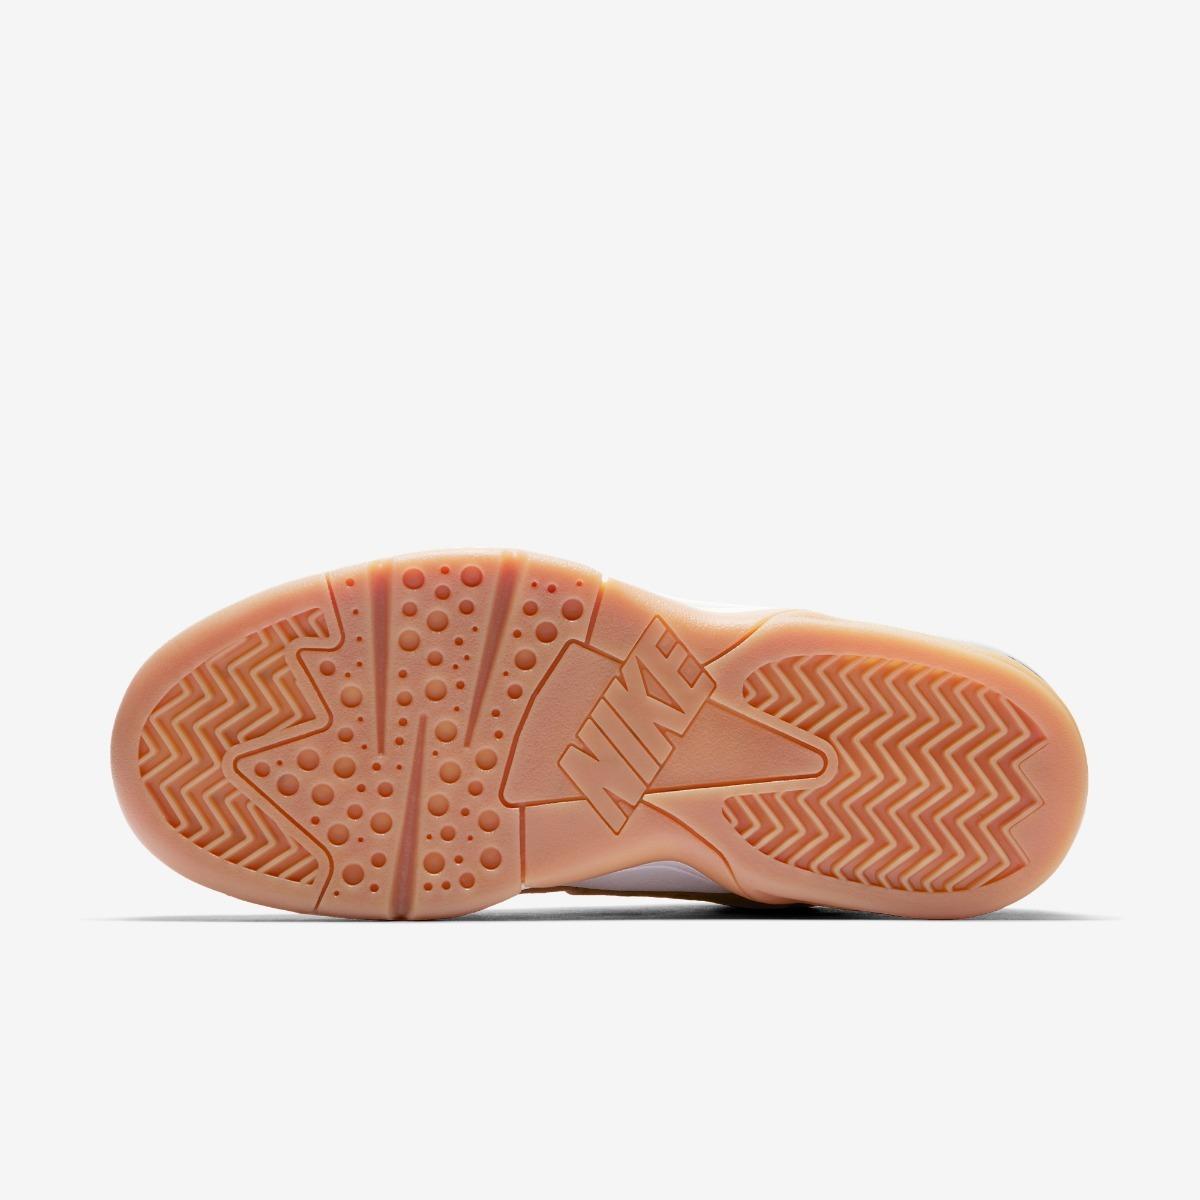 12f37f433f5bd zapatillas nike air force max premium flax wheat original. Cargando zoom.